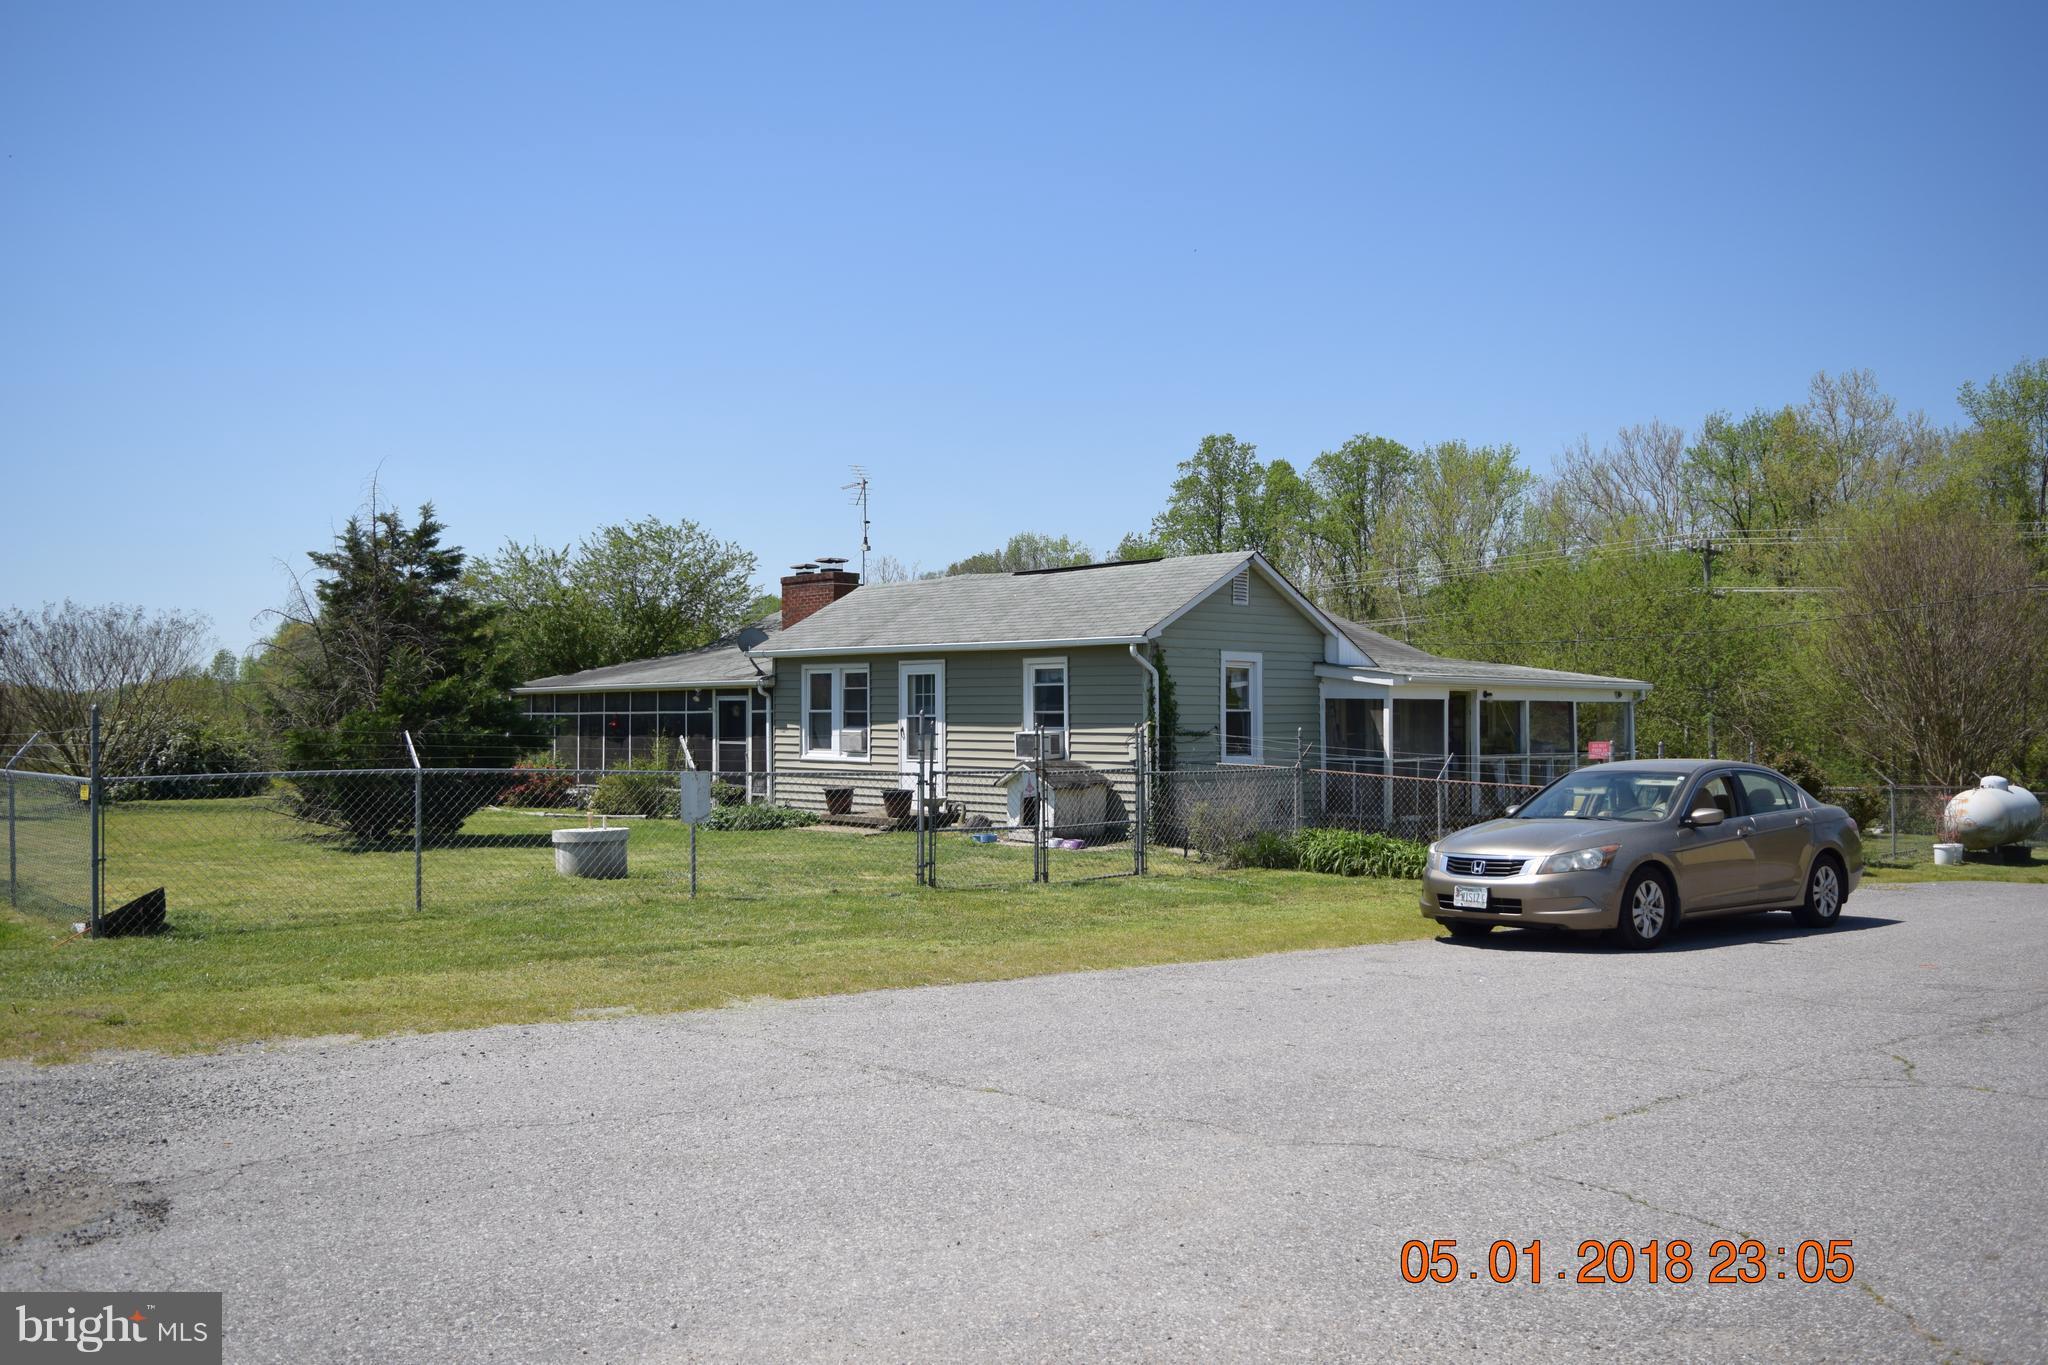 6136 JEFFERSON DAVIS HIGHWAY, WOODFORD, VA 22580